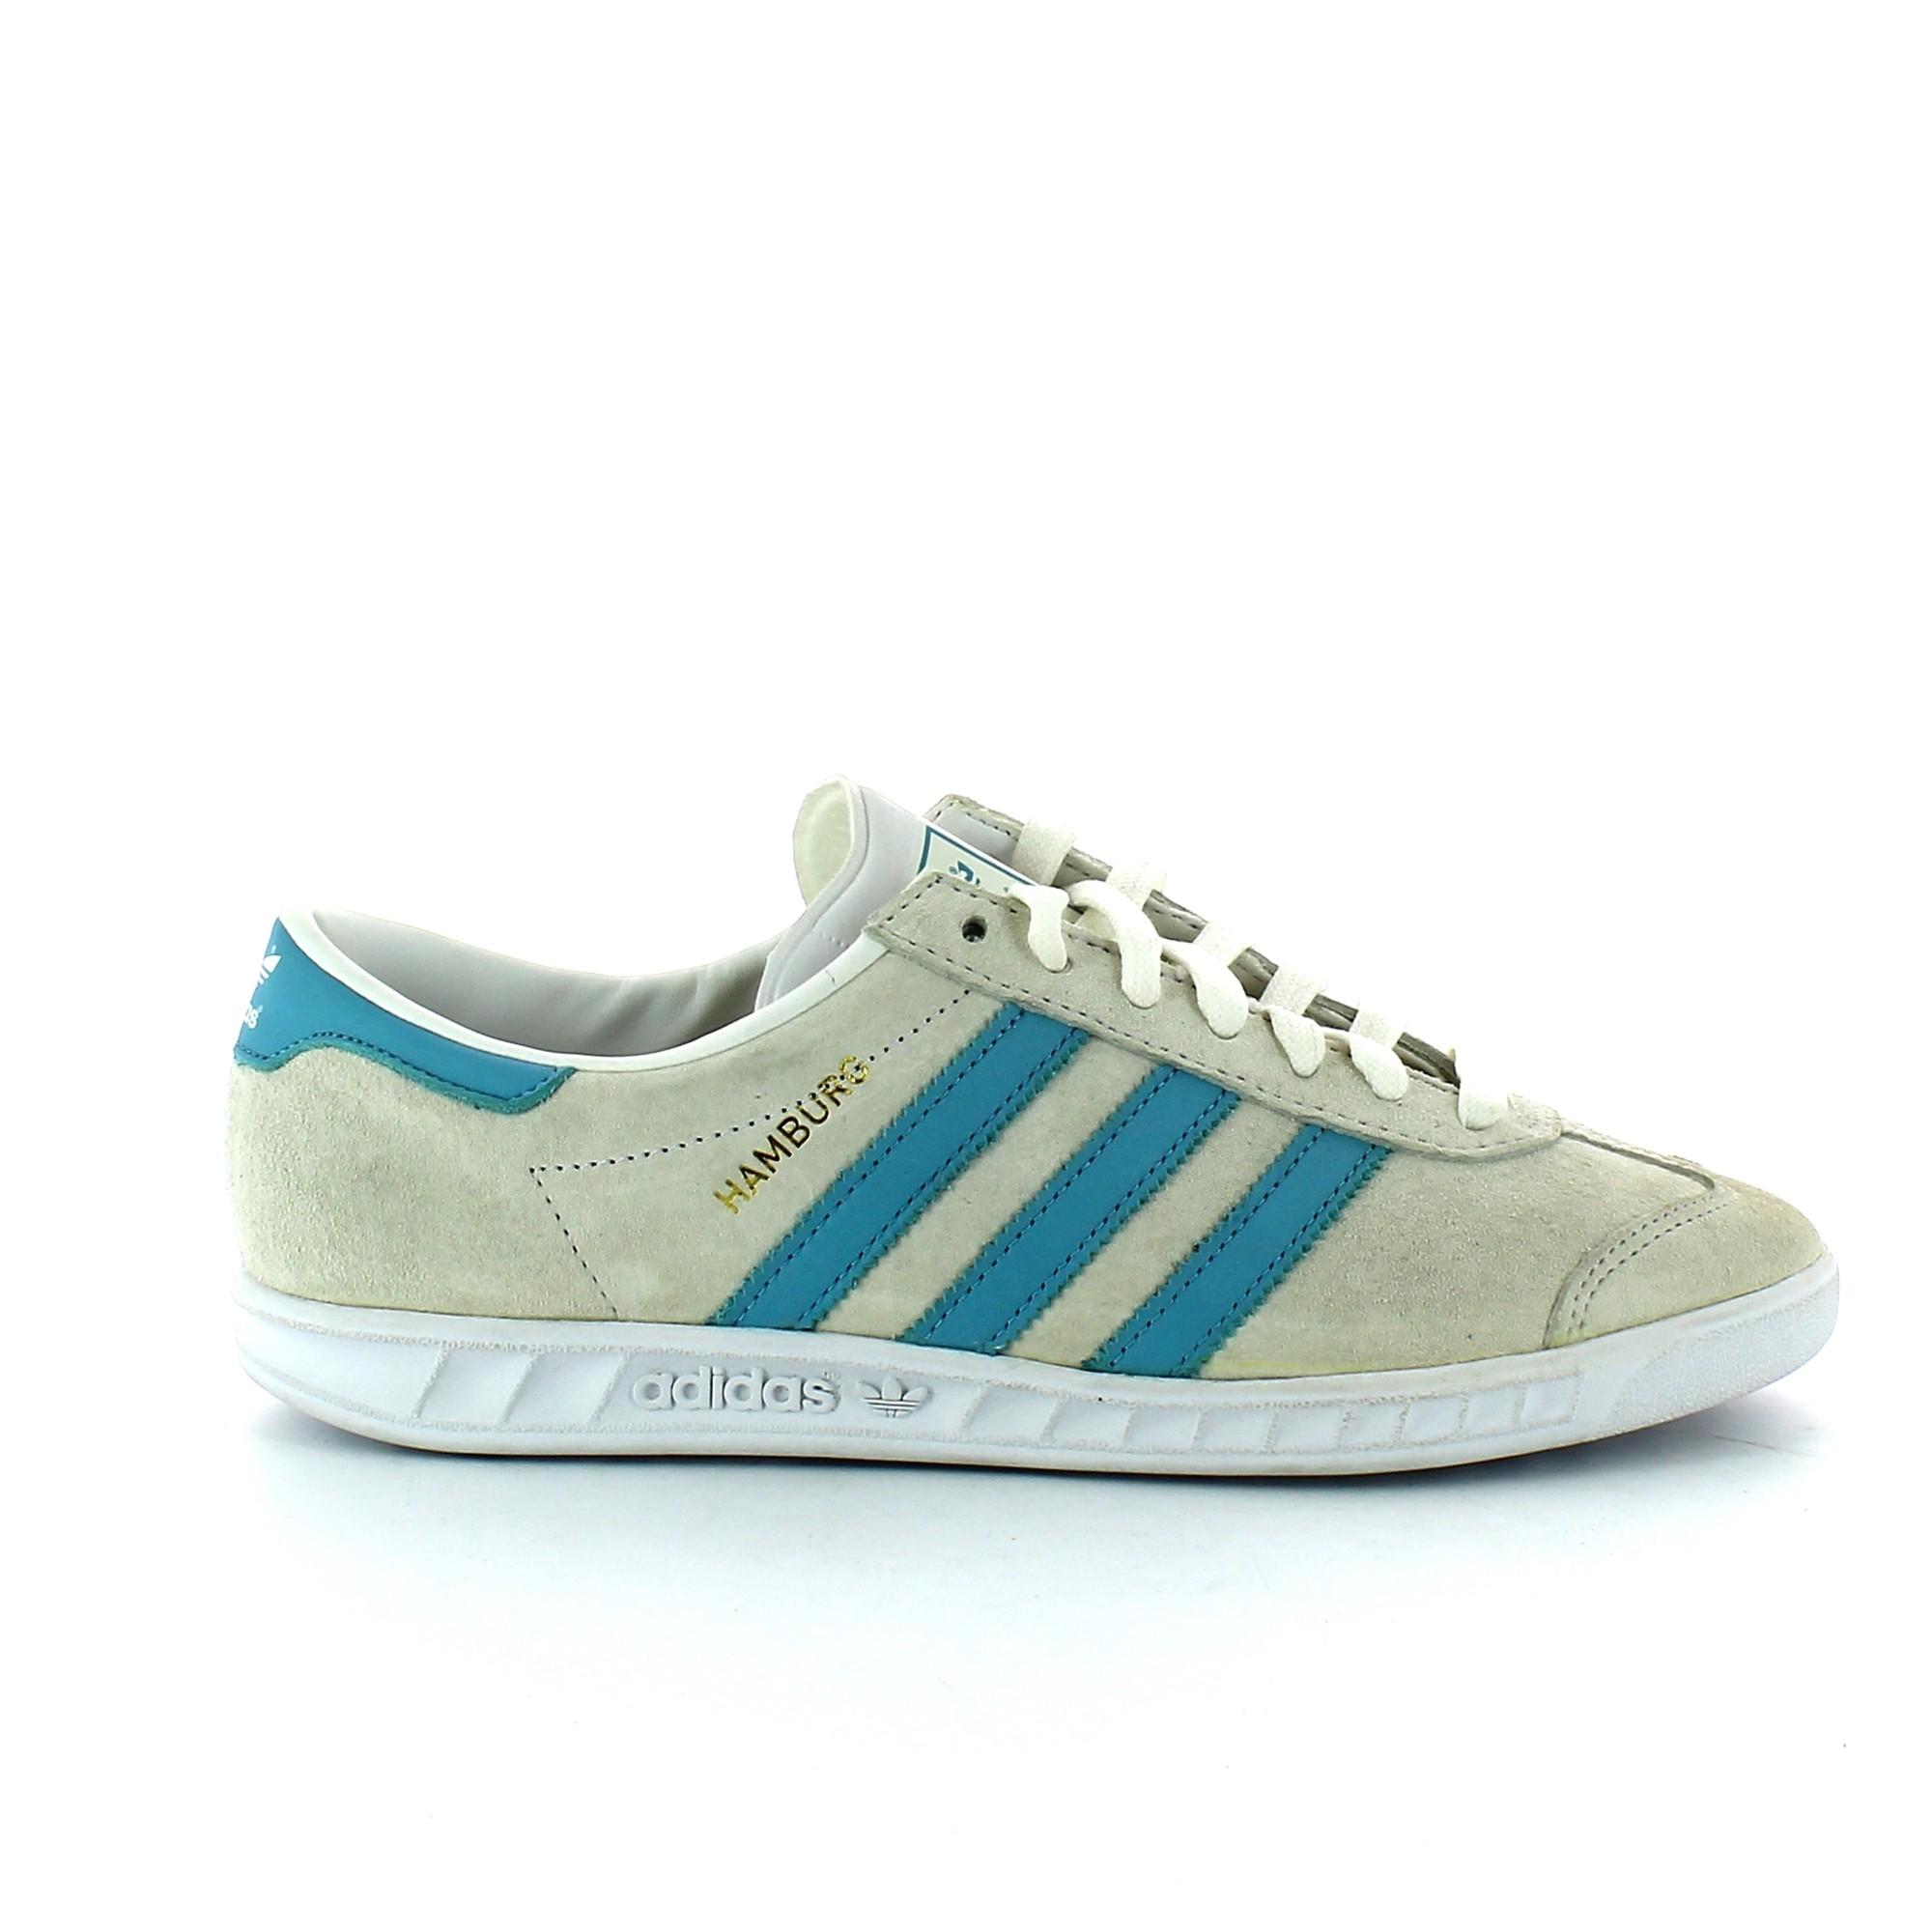 best loved 2d793 34ee4 Zapatillas Adidas Hamburg Blanco Celeste Hombre - Deportes M